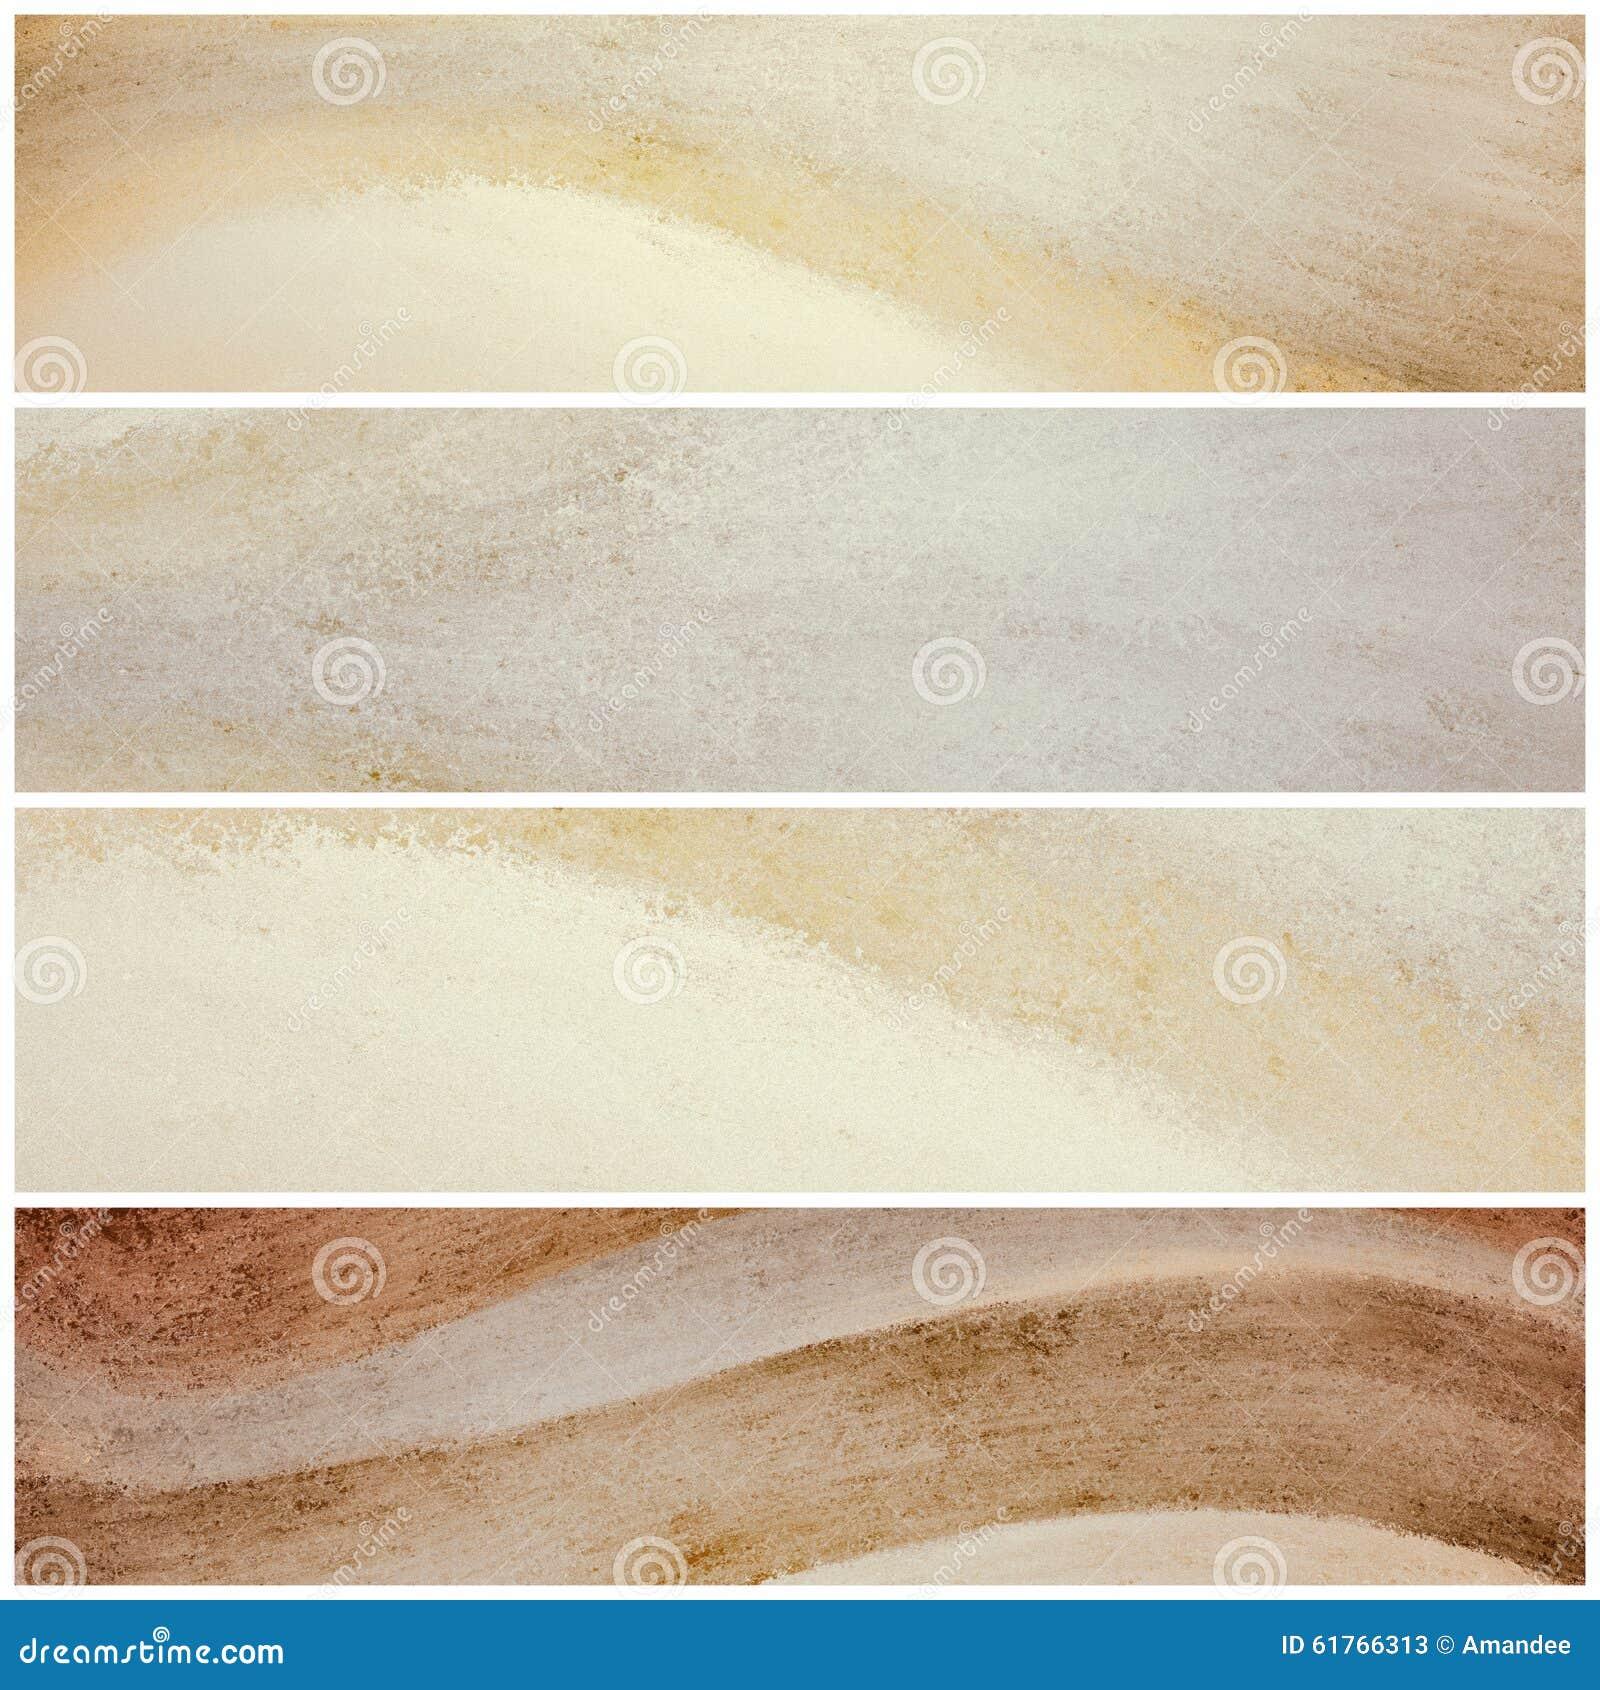 wavy natural color website banners or stripes graphic art. Black Bedroom Furniture Sets. Home Design Ideas